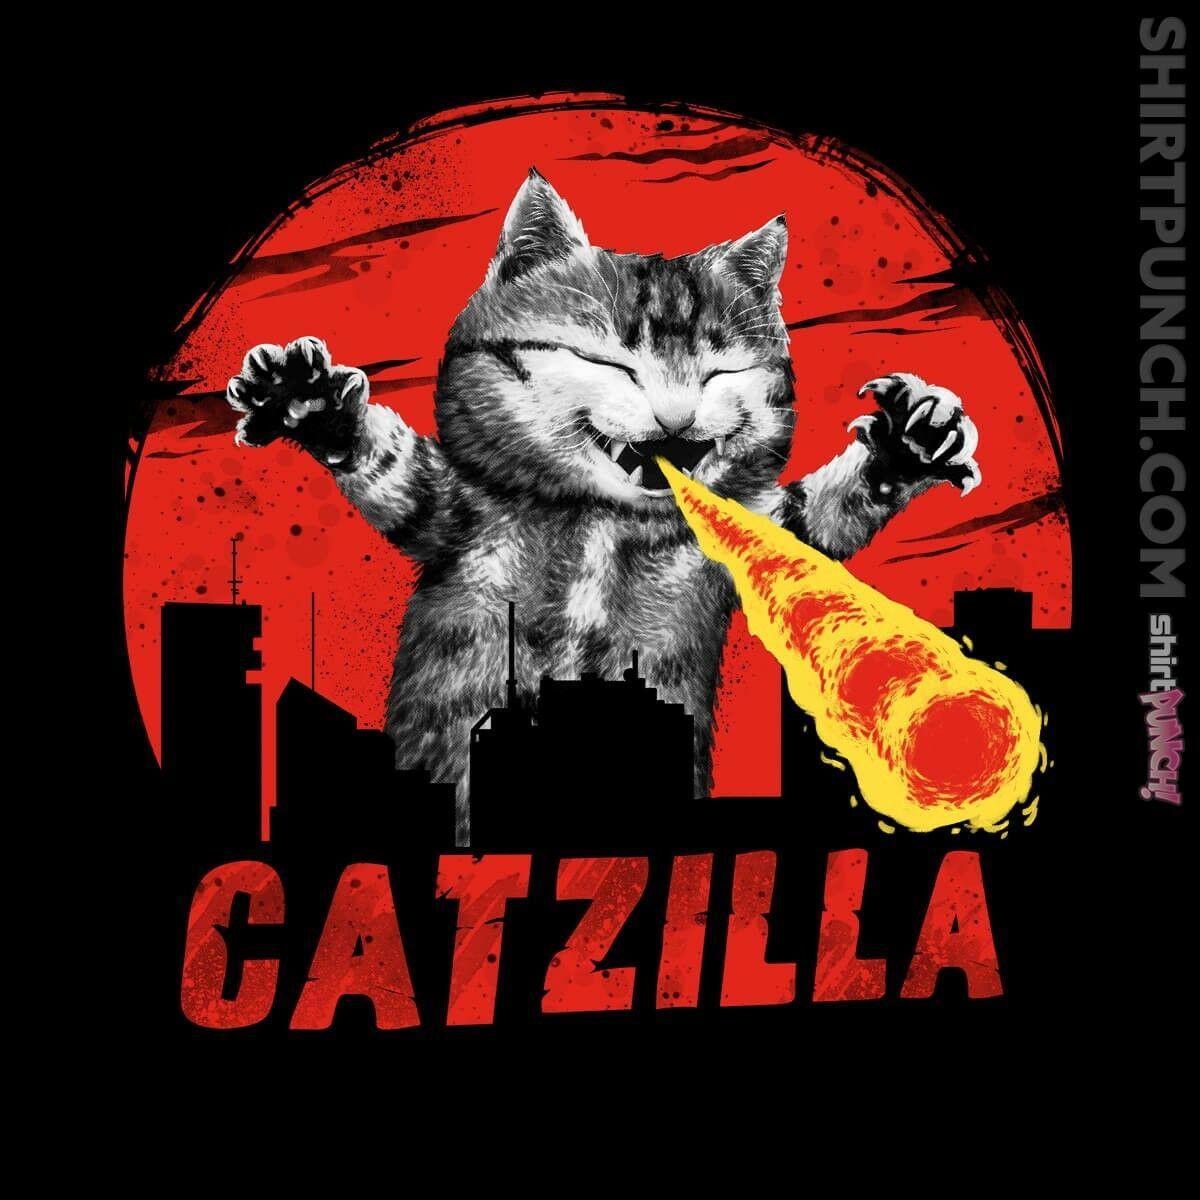 Gojira Kaiju, rey de los monstruos Tokio atómica CATZILLA camiseta (2XL)